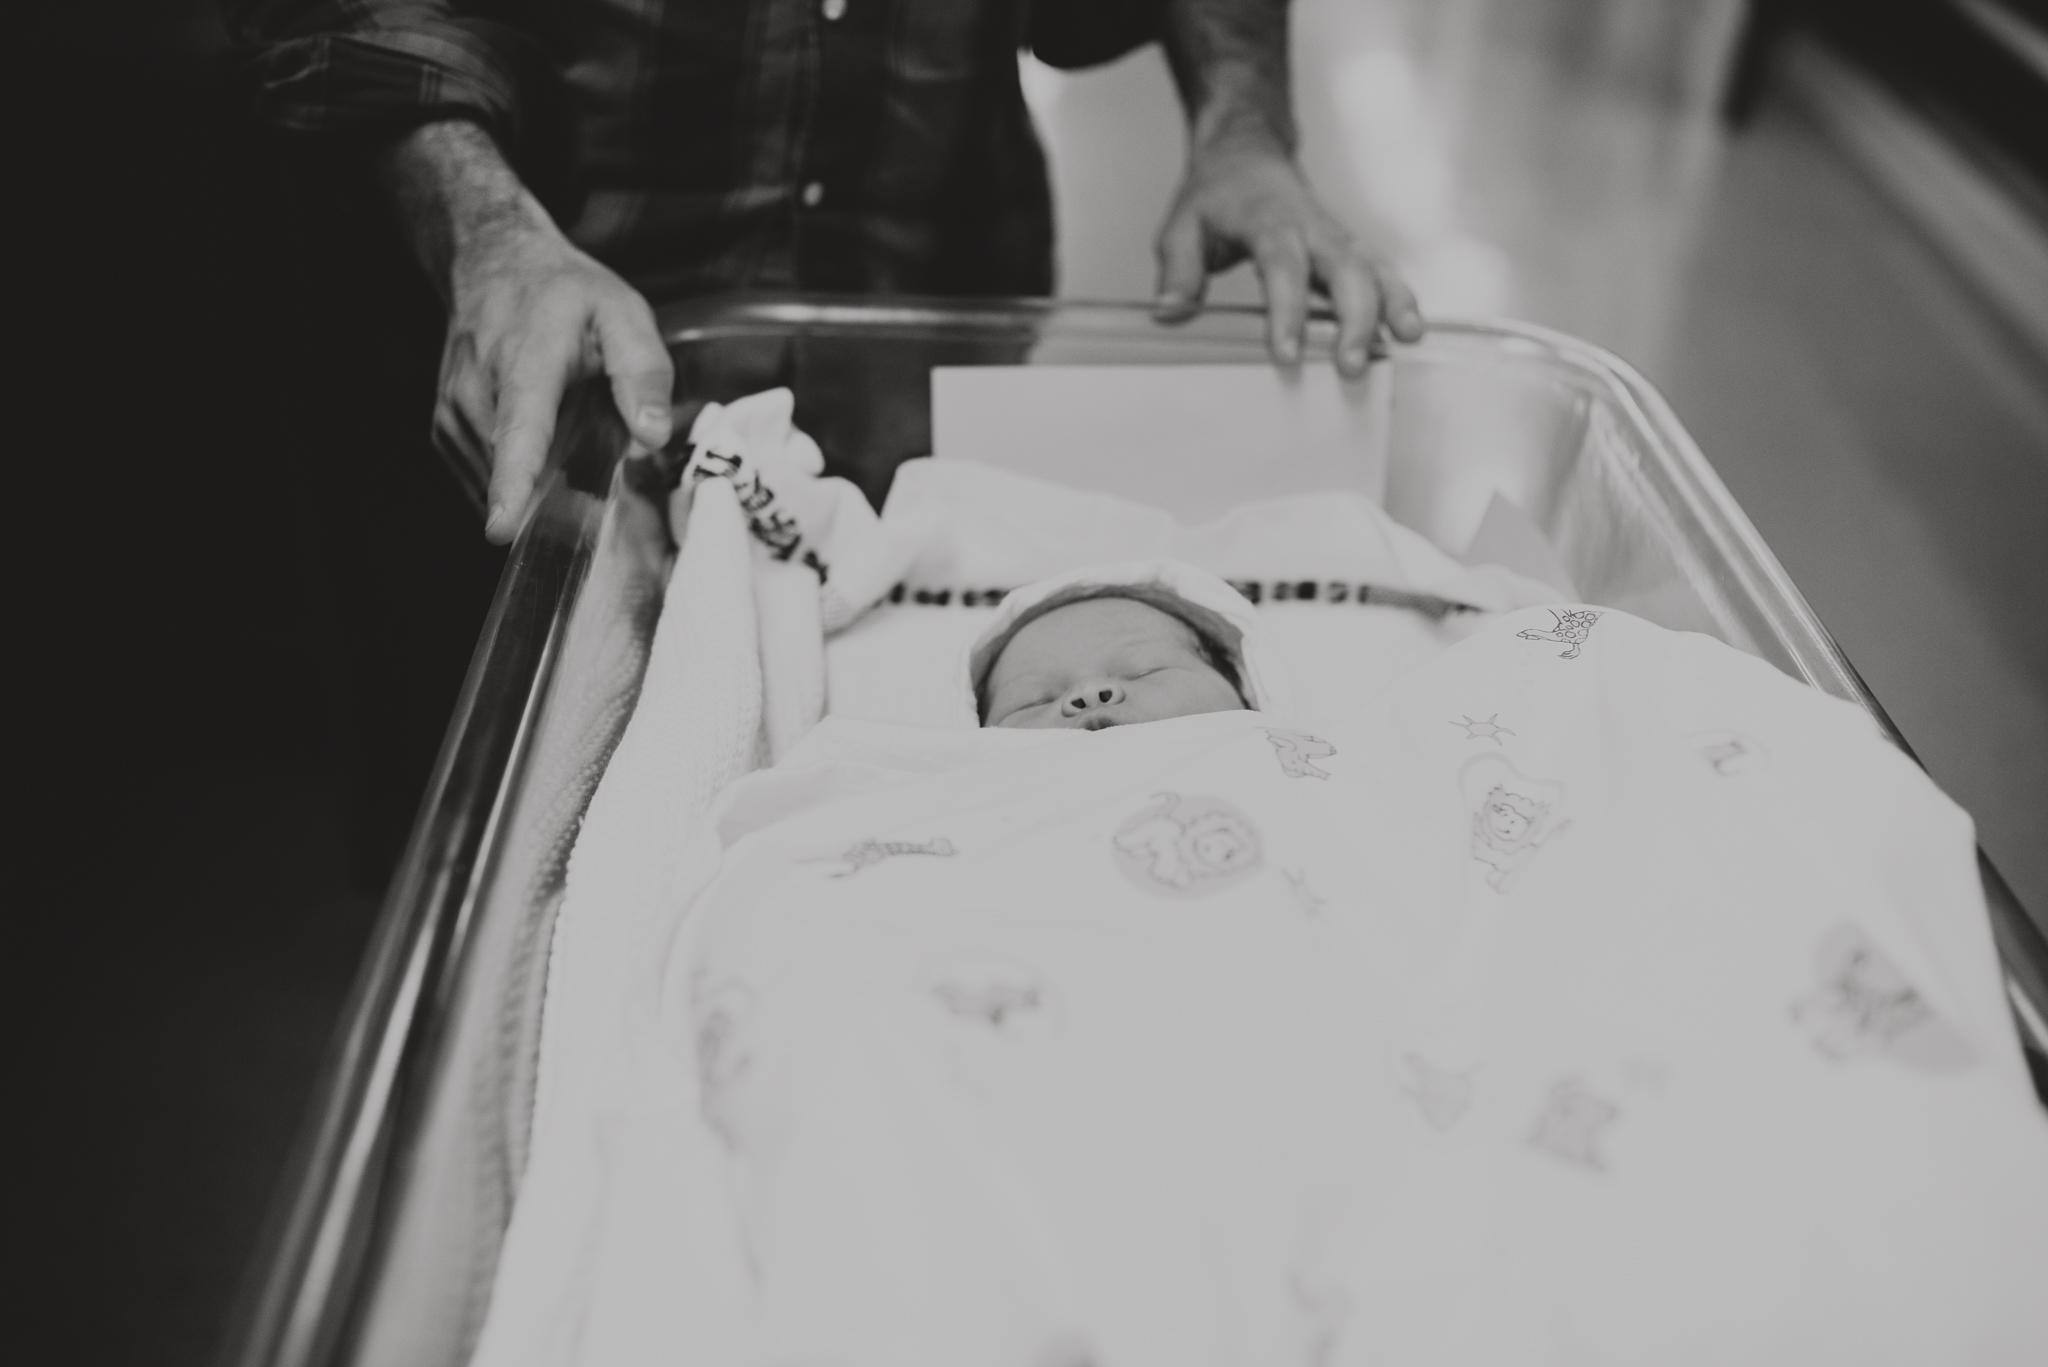 nyfødtfotografering-fødselsfotografering-babyfotografering-maria-vatne-kongsberg-oslo-53.jpg